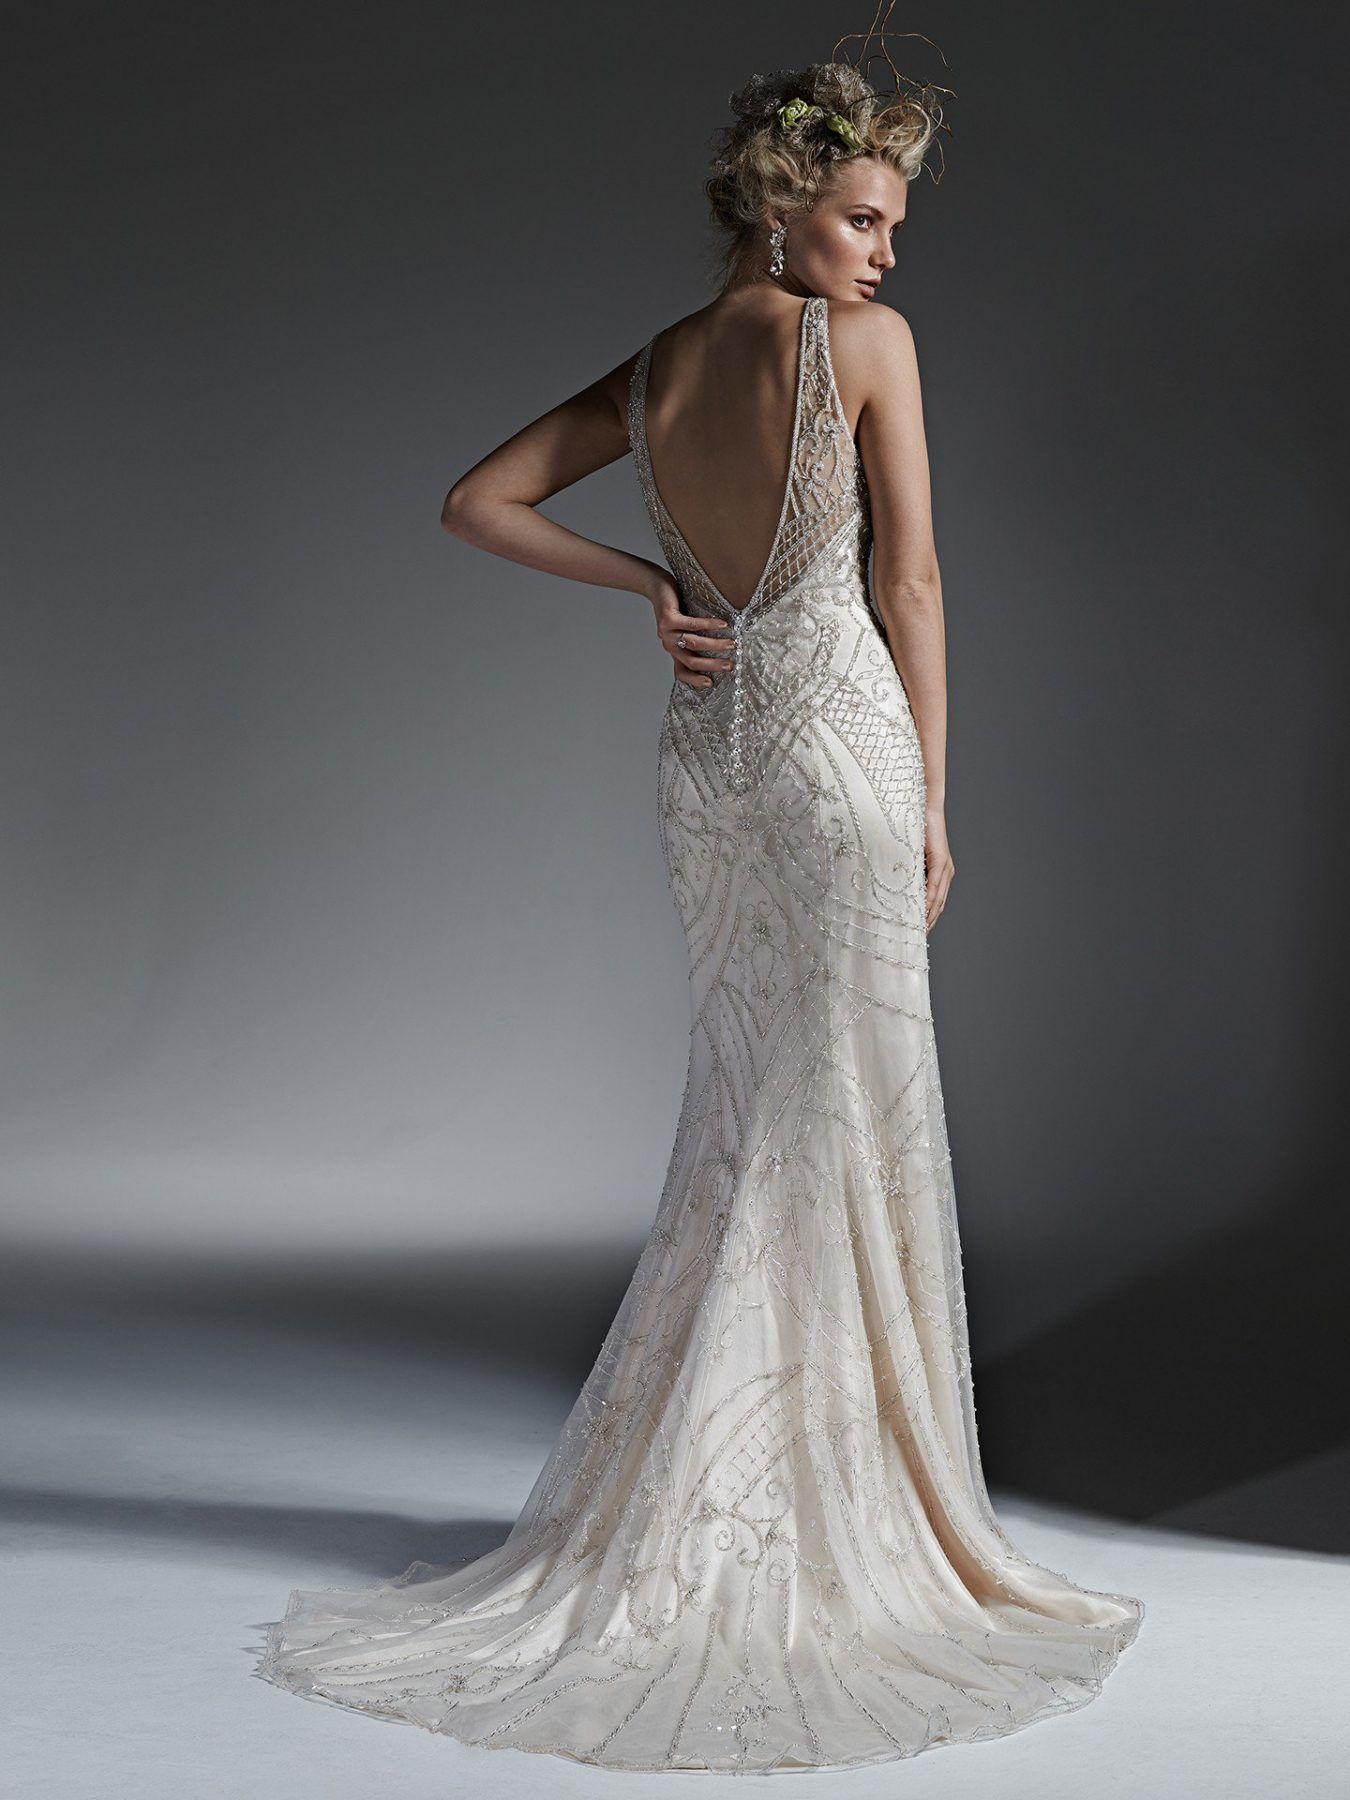 Beaded sheath wedding dress  High Neckline Fully Beaded Sheath Wedding Dress by Maggie Sottero